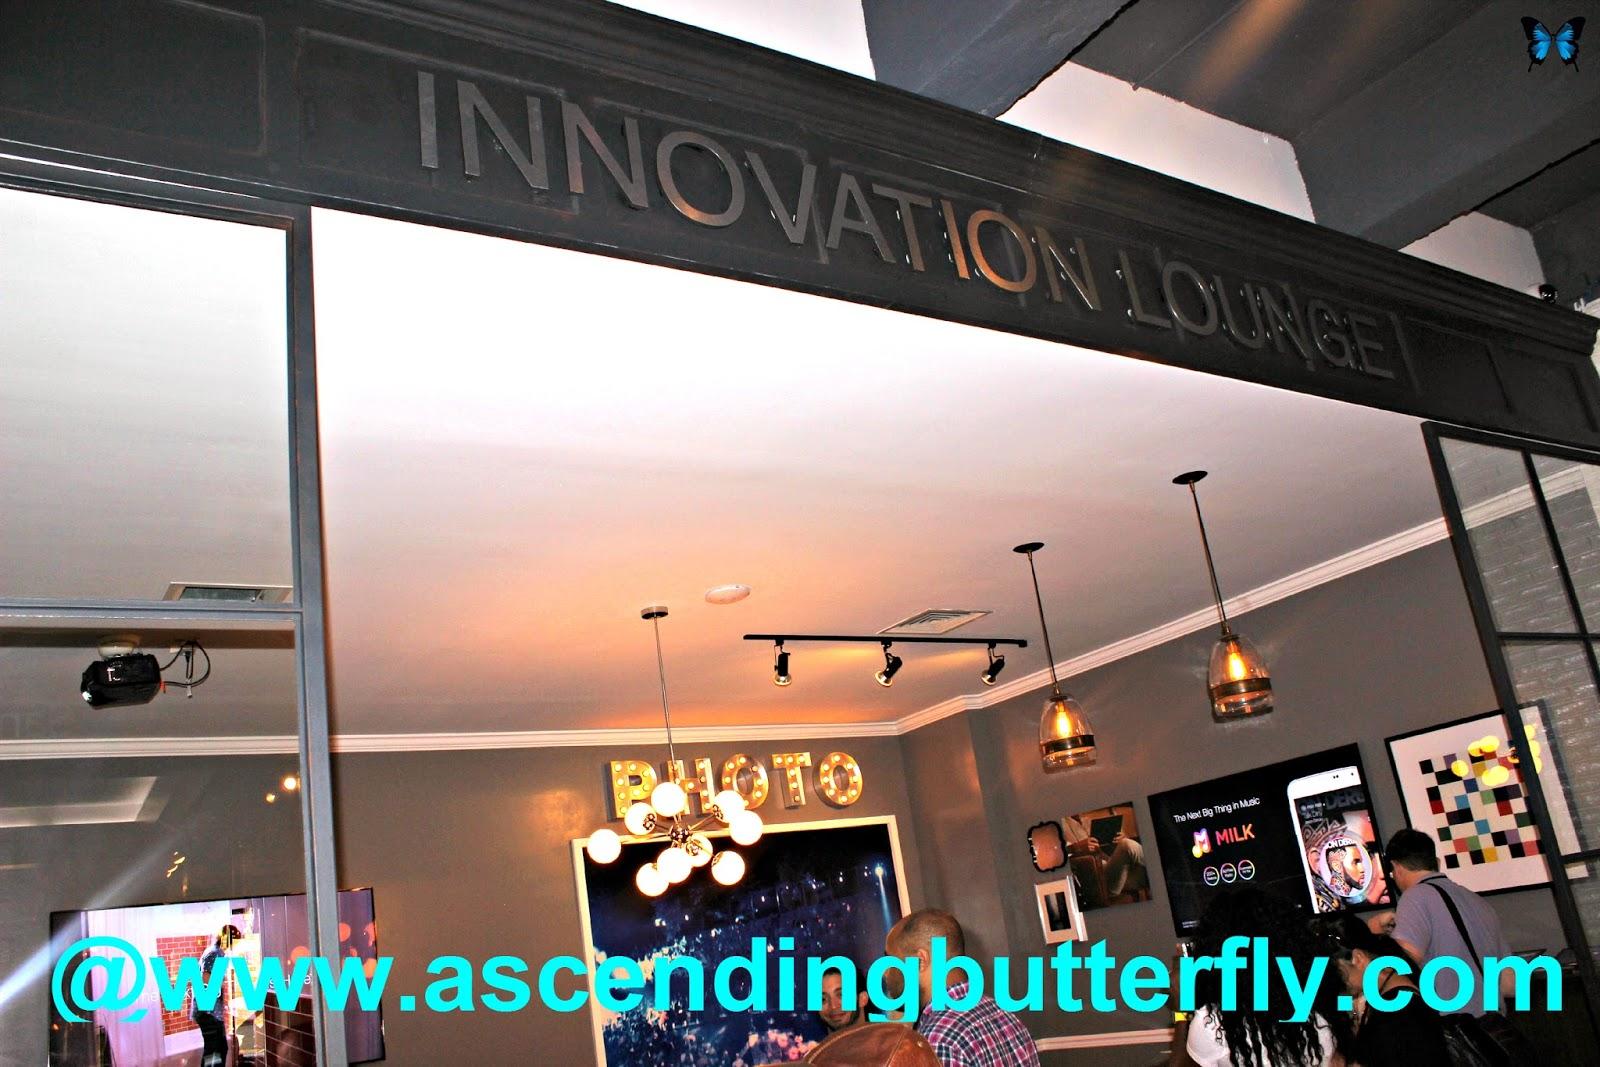 Innovation Lounge at the SoHo Samsung Galaxy Studio